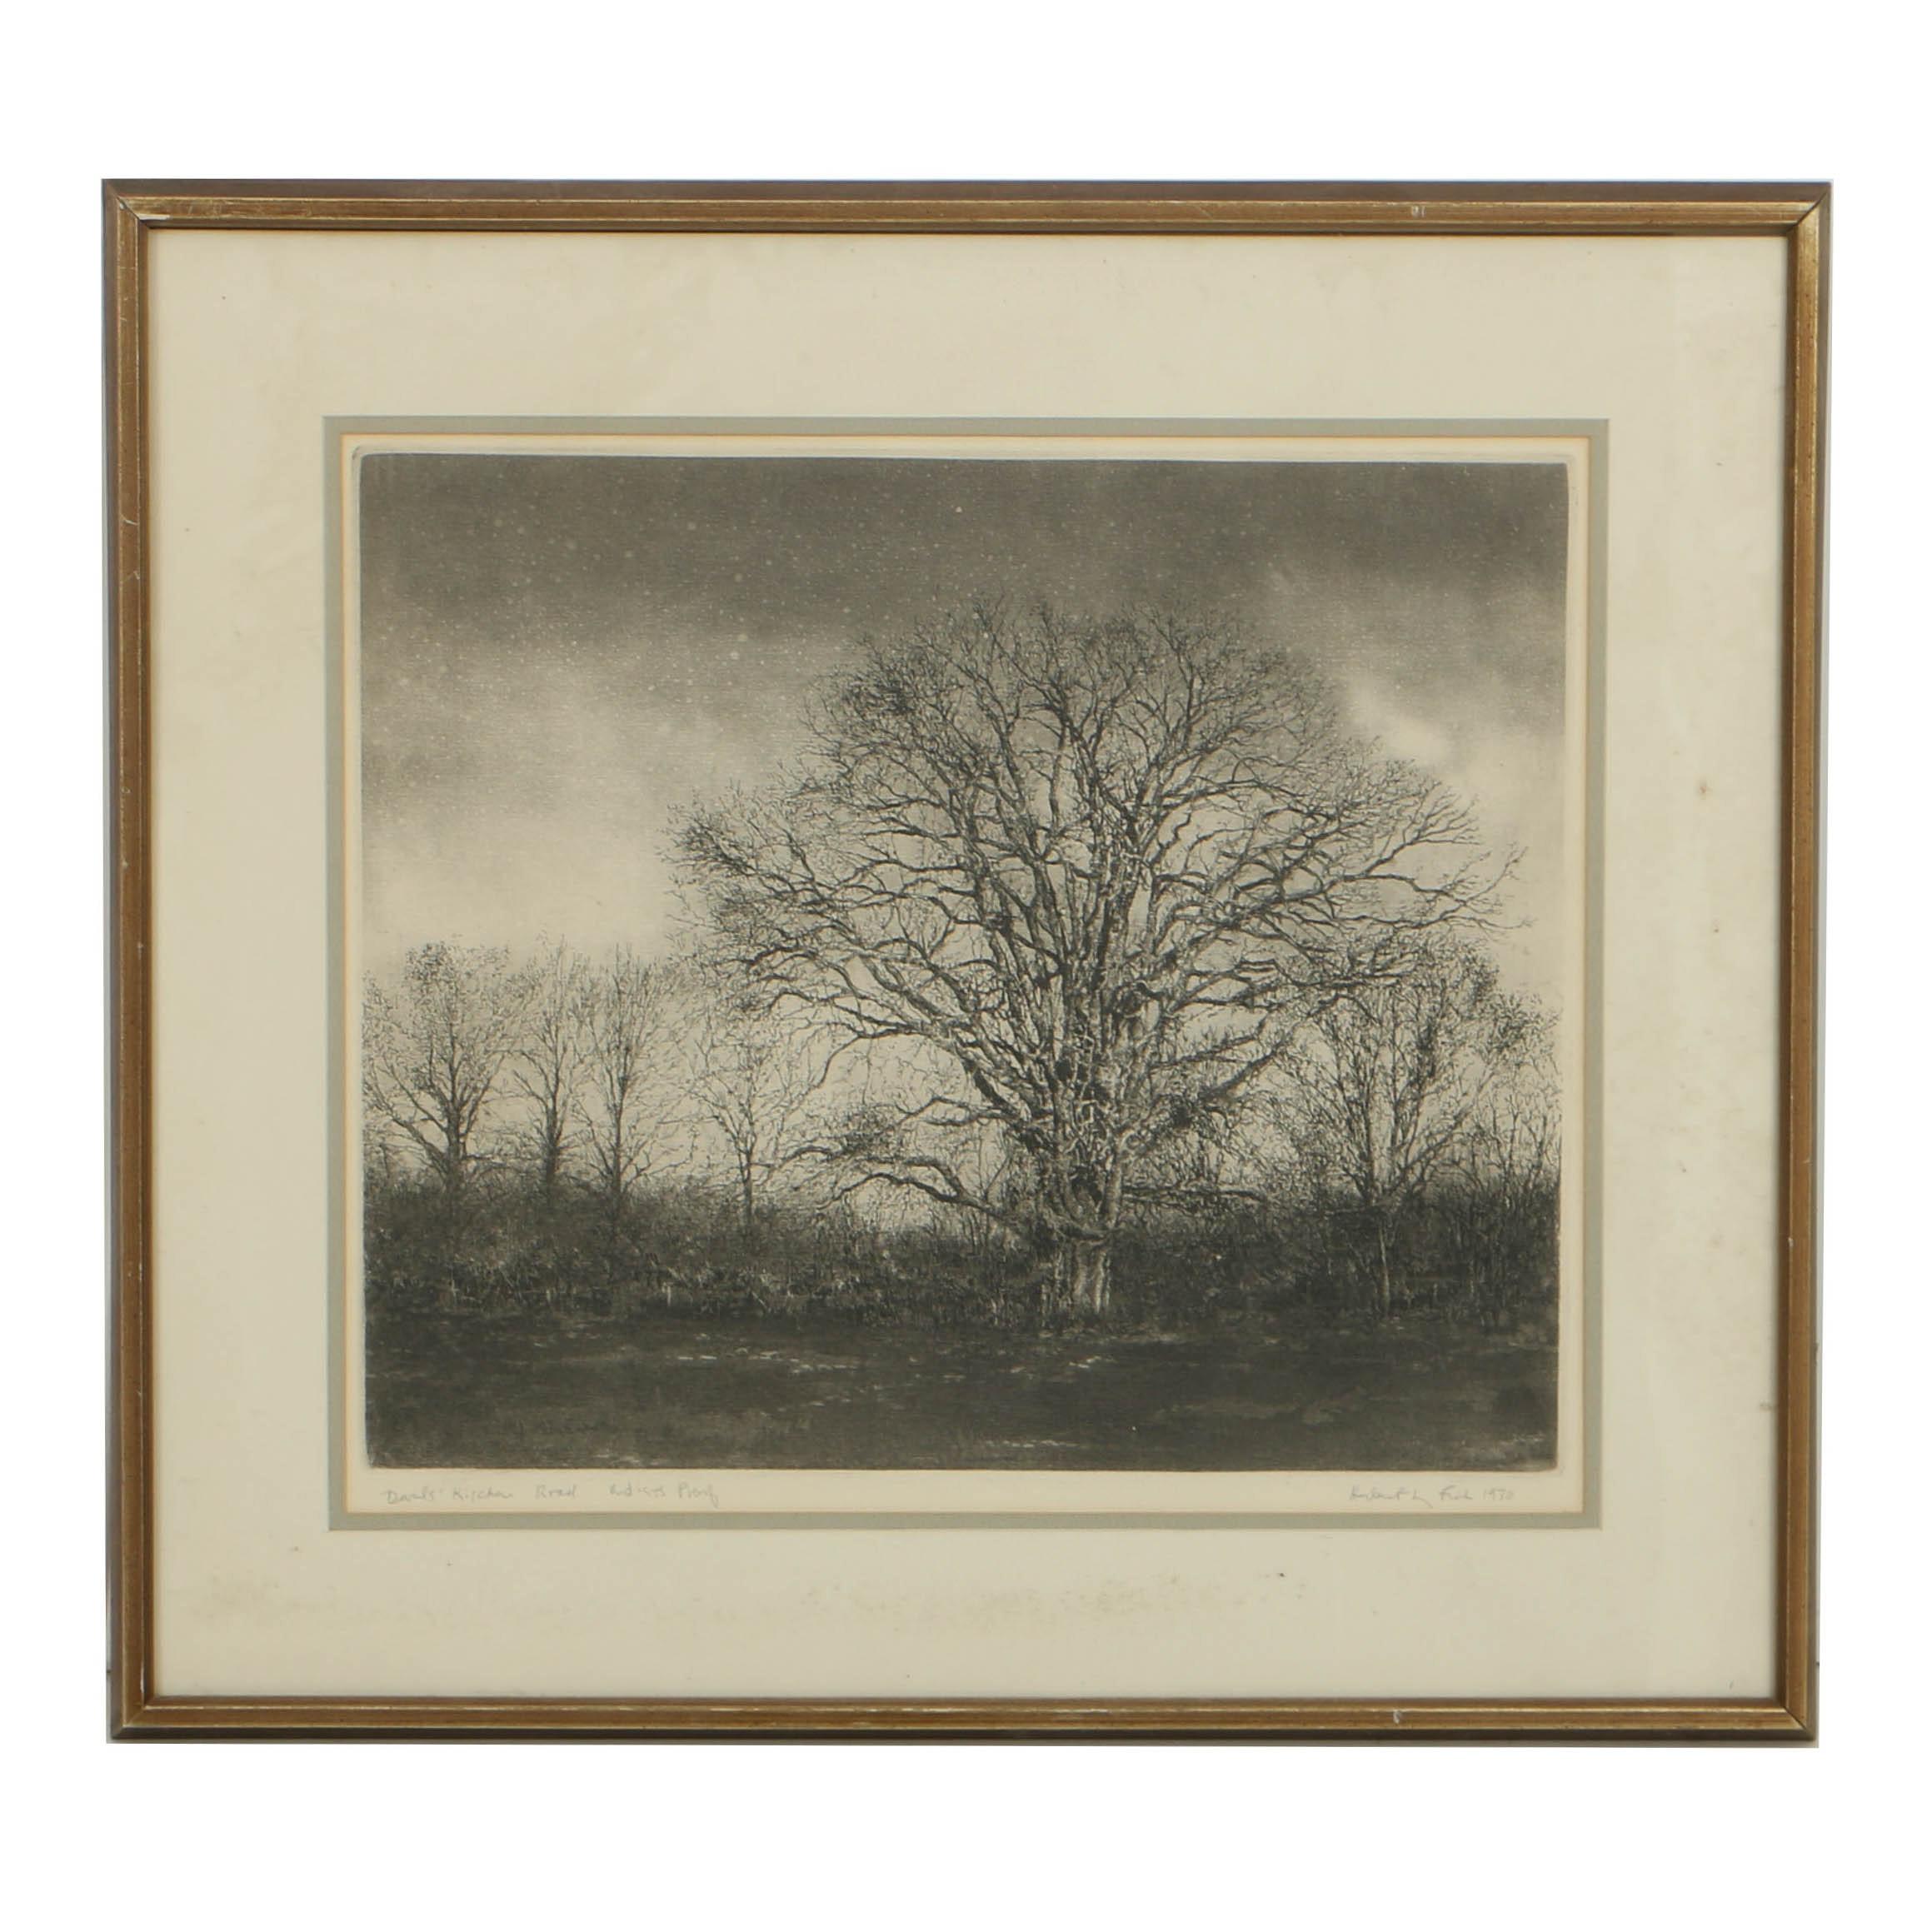 "Herbert Fink Signed Artist's Proof Etching on Paper ""Davids' Kitchen Road"""